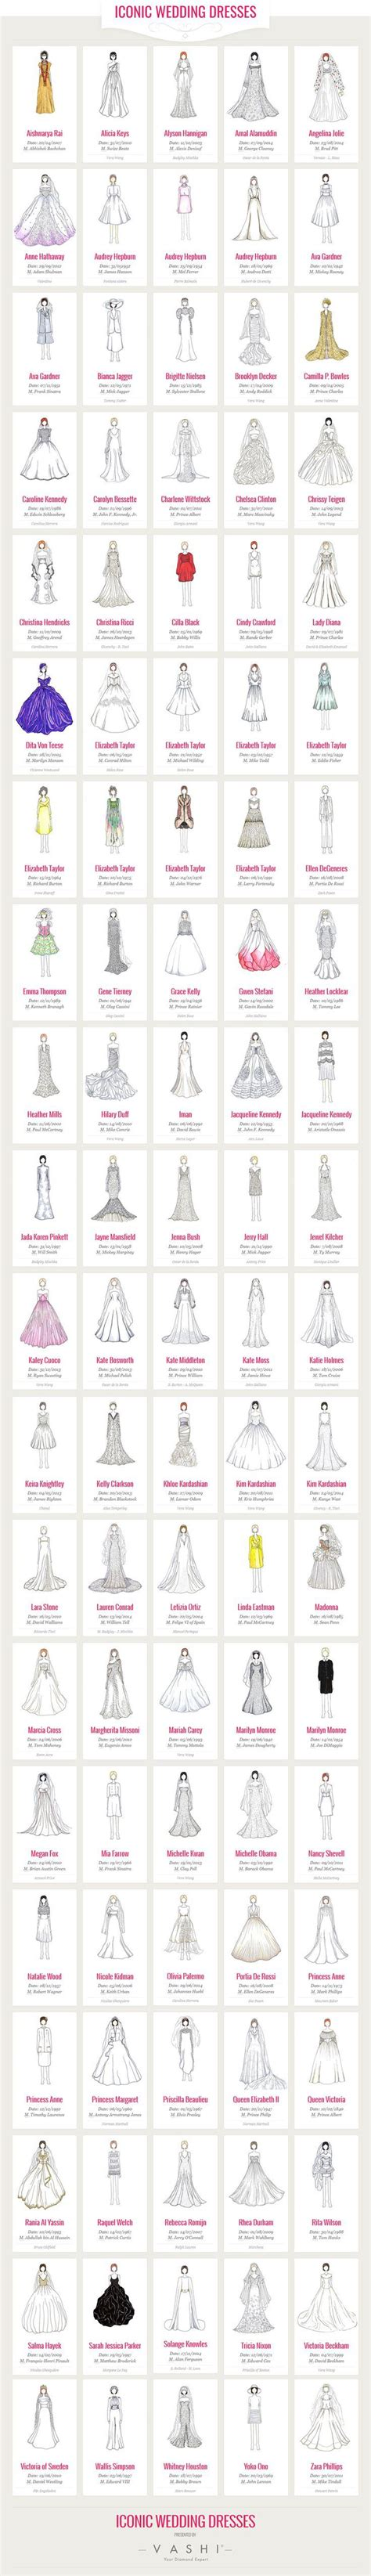 libro the dress 100 iconic dress the 100 most iconic wedding dresses 2411003 weddbook